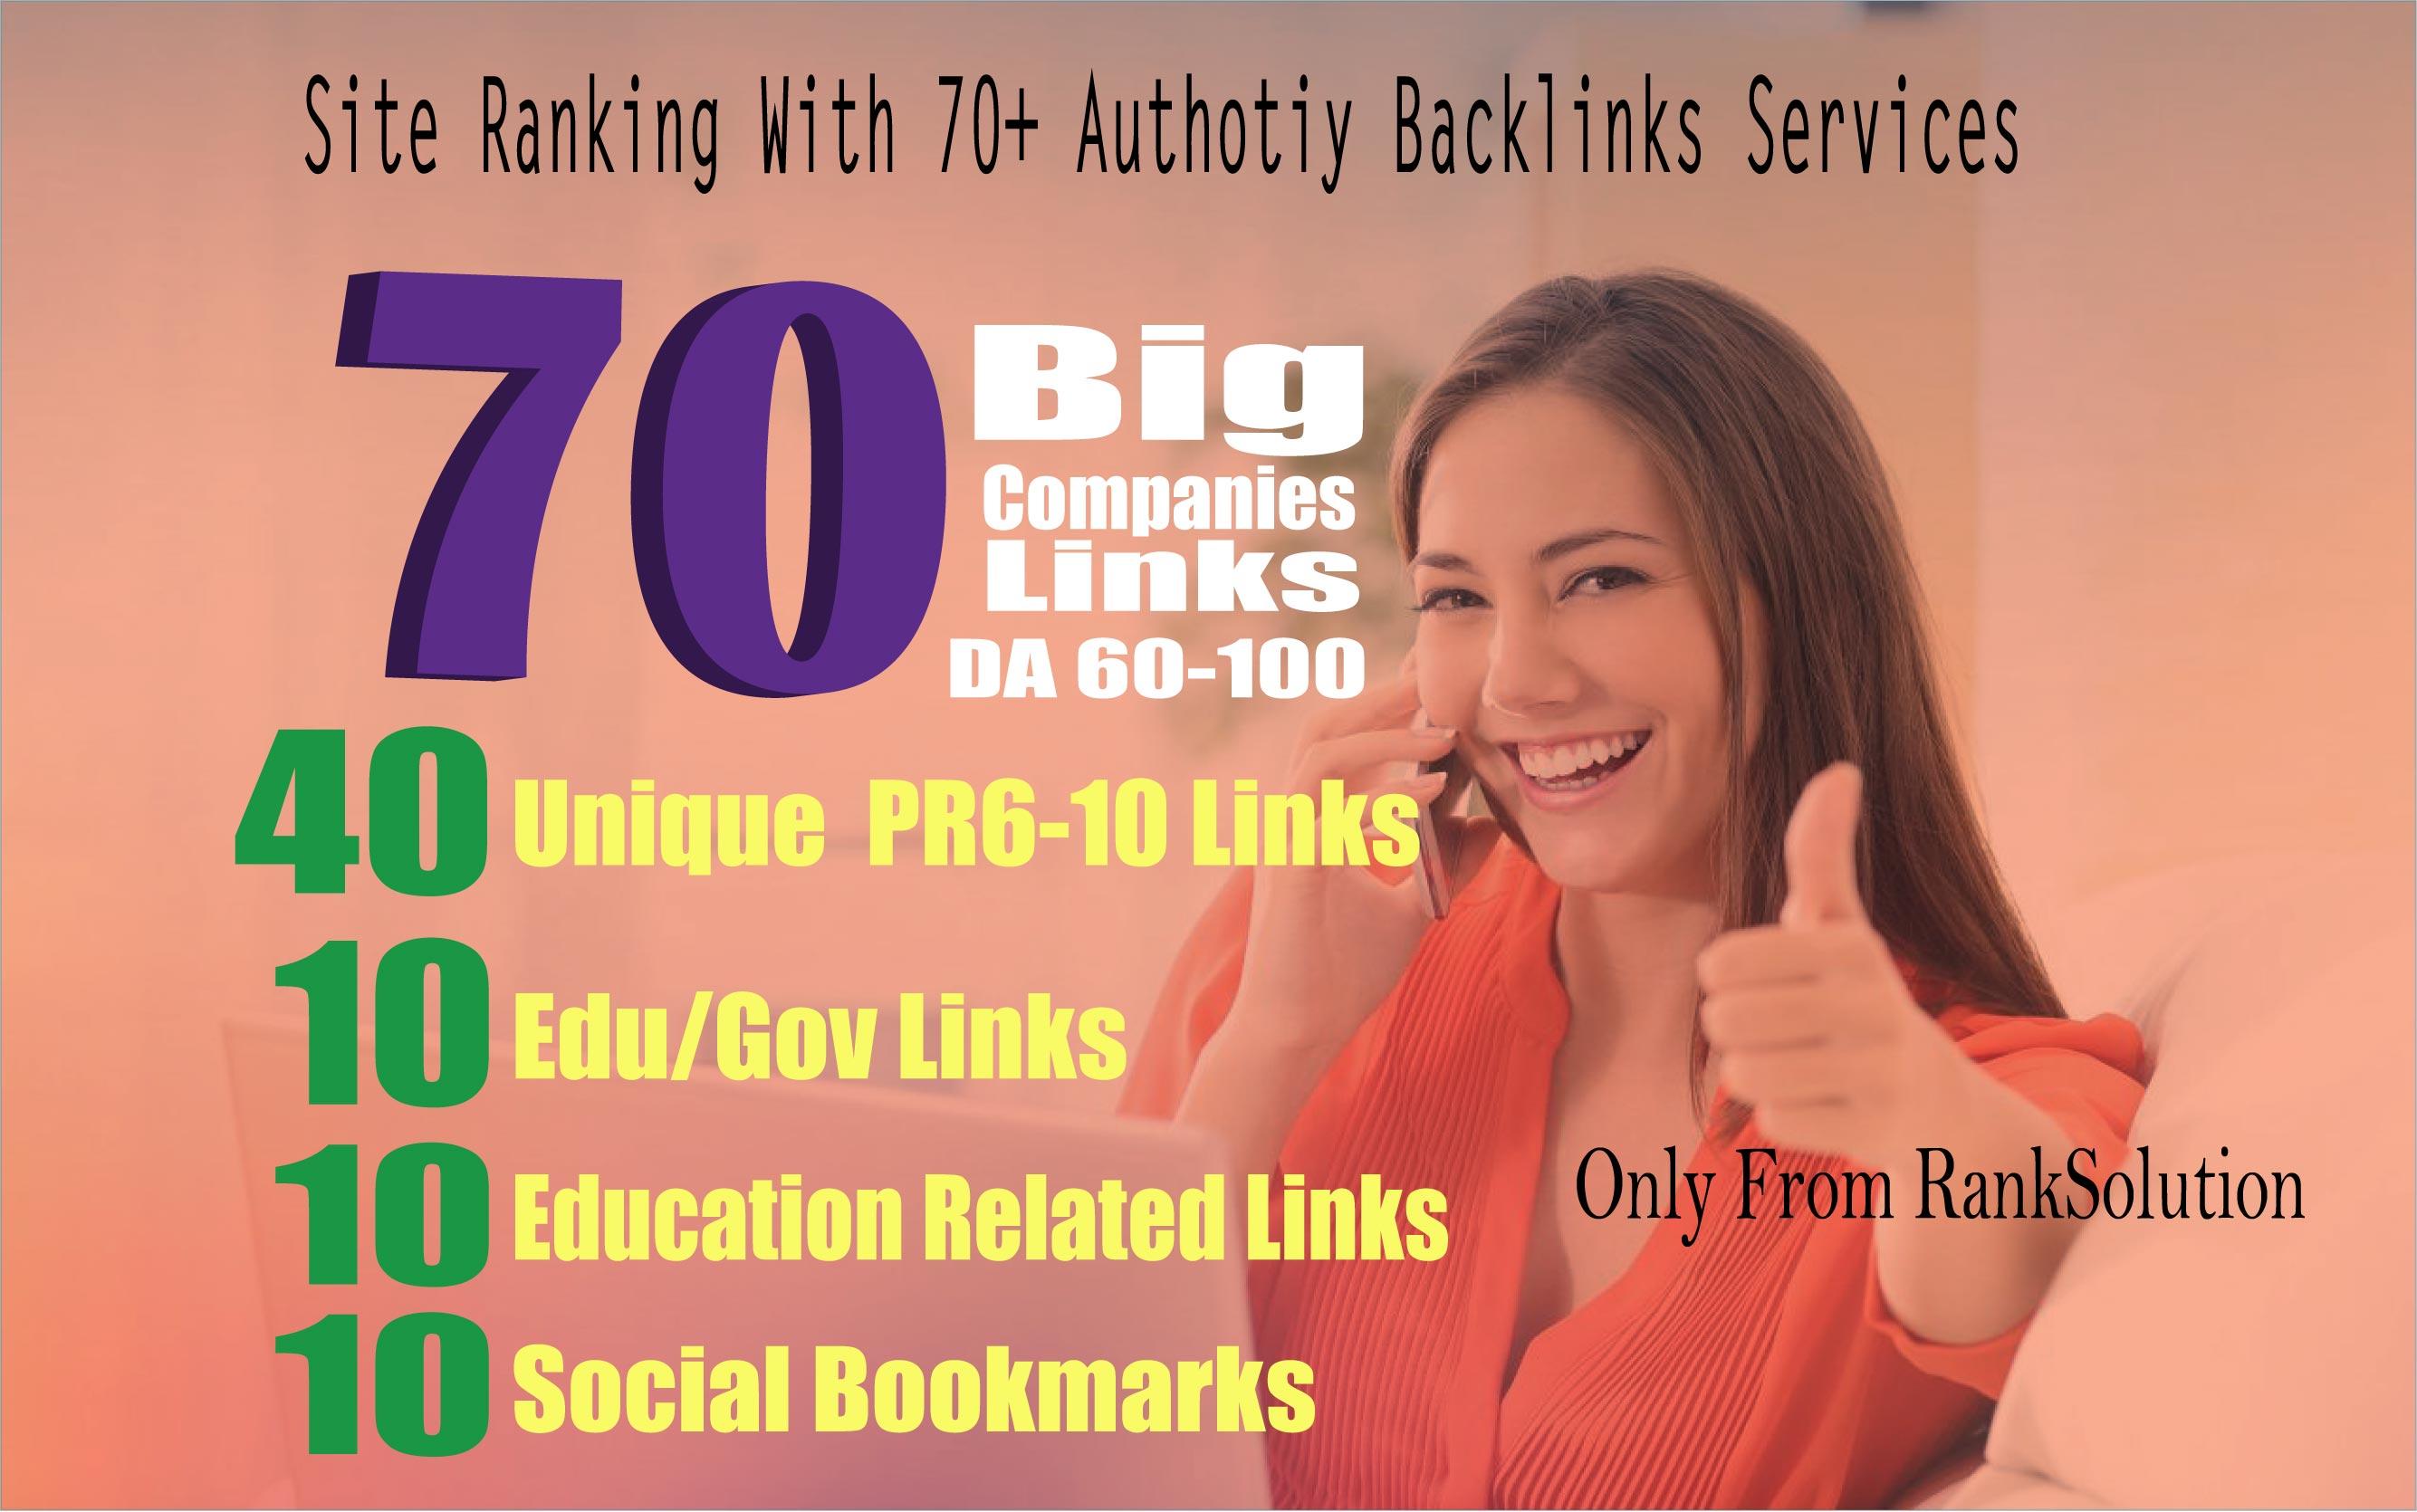 Create 70 Big Companies Links_ Link From 40 Unique Domain, 20 Gov/Edu, 10 SOCIAL Bookmark